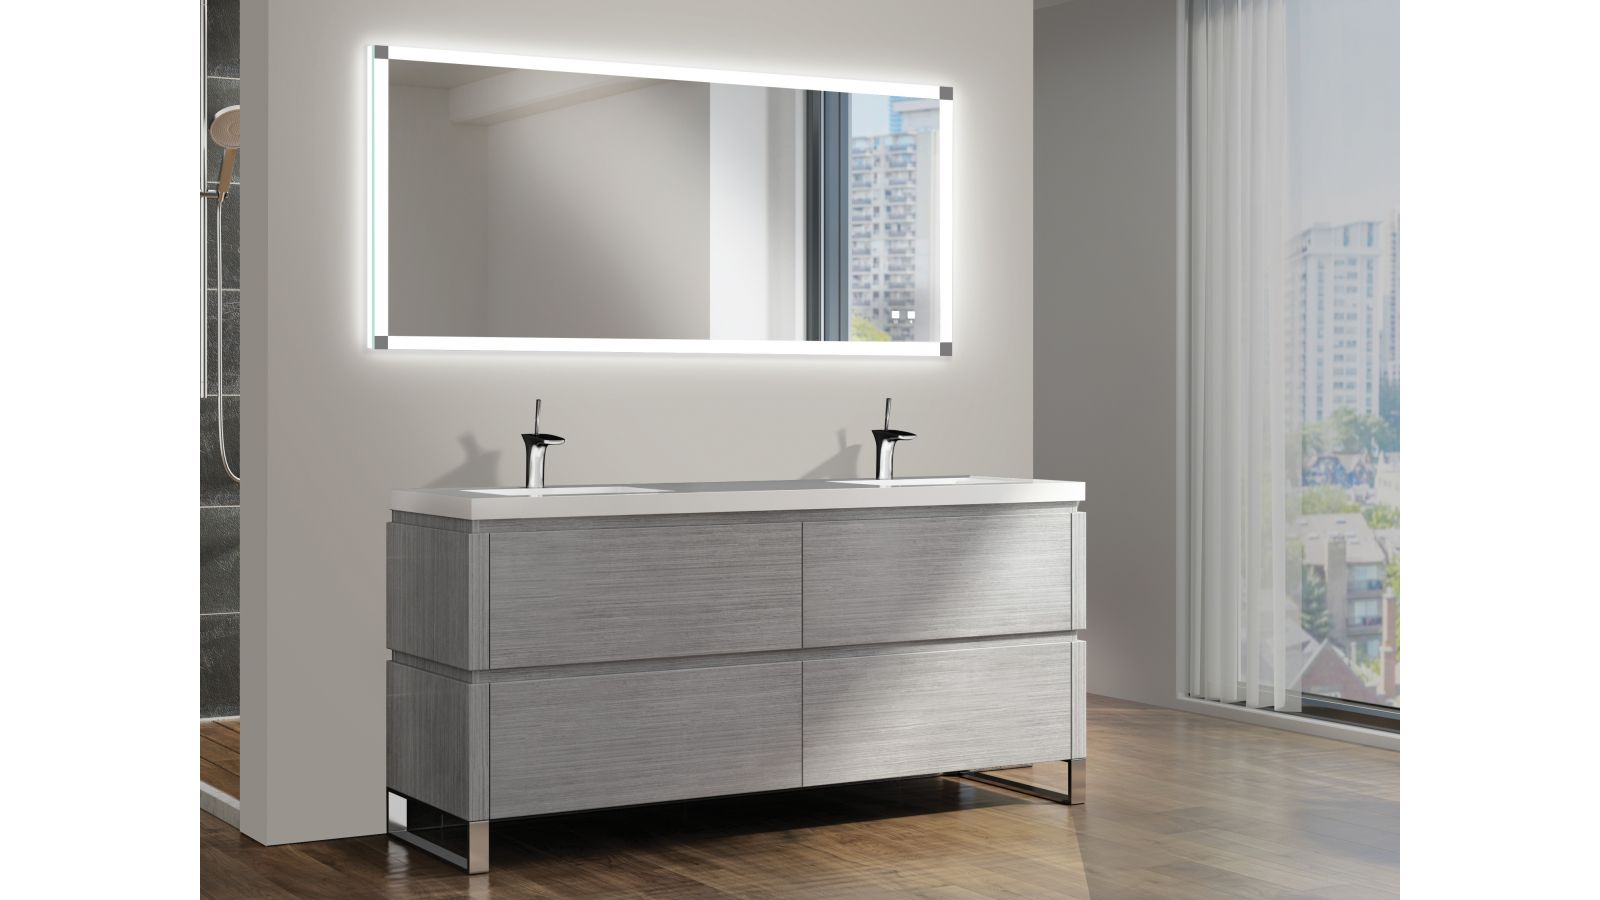 The Tranquility Illuminated Slique™ Mirror